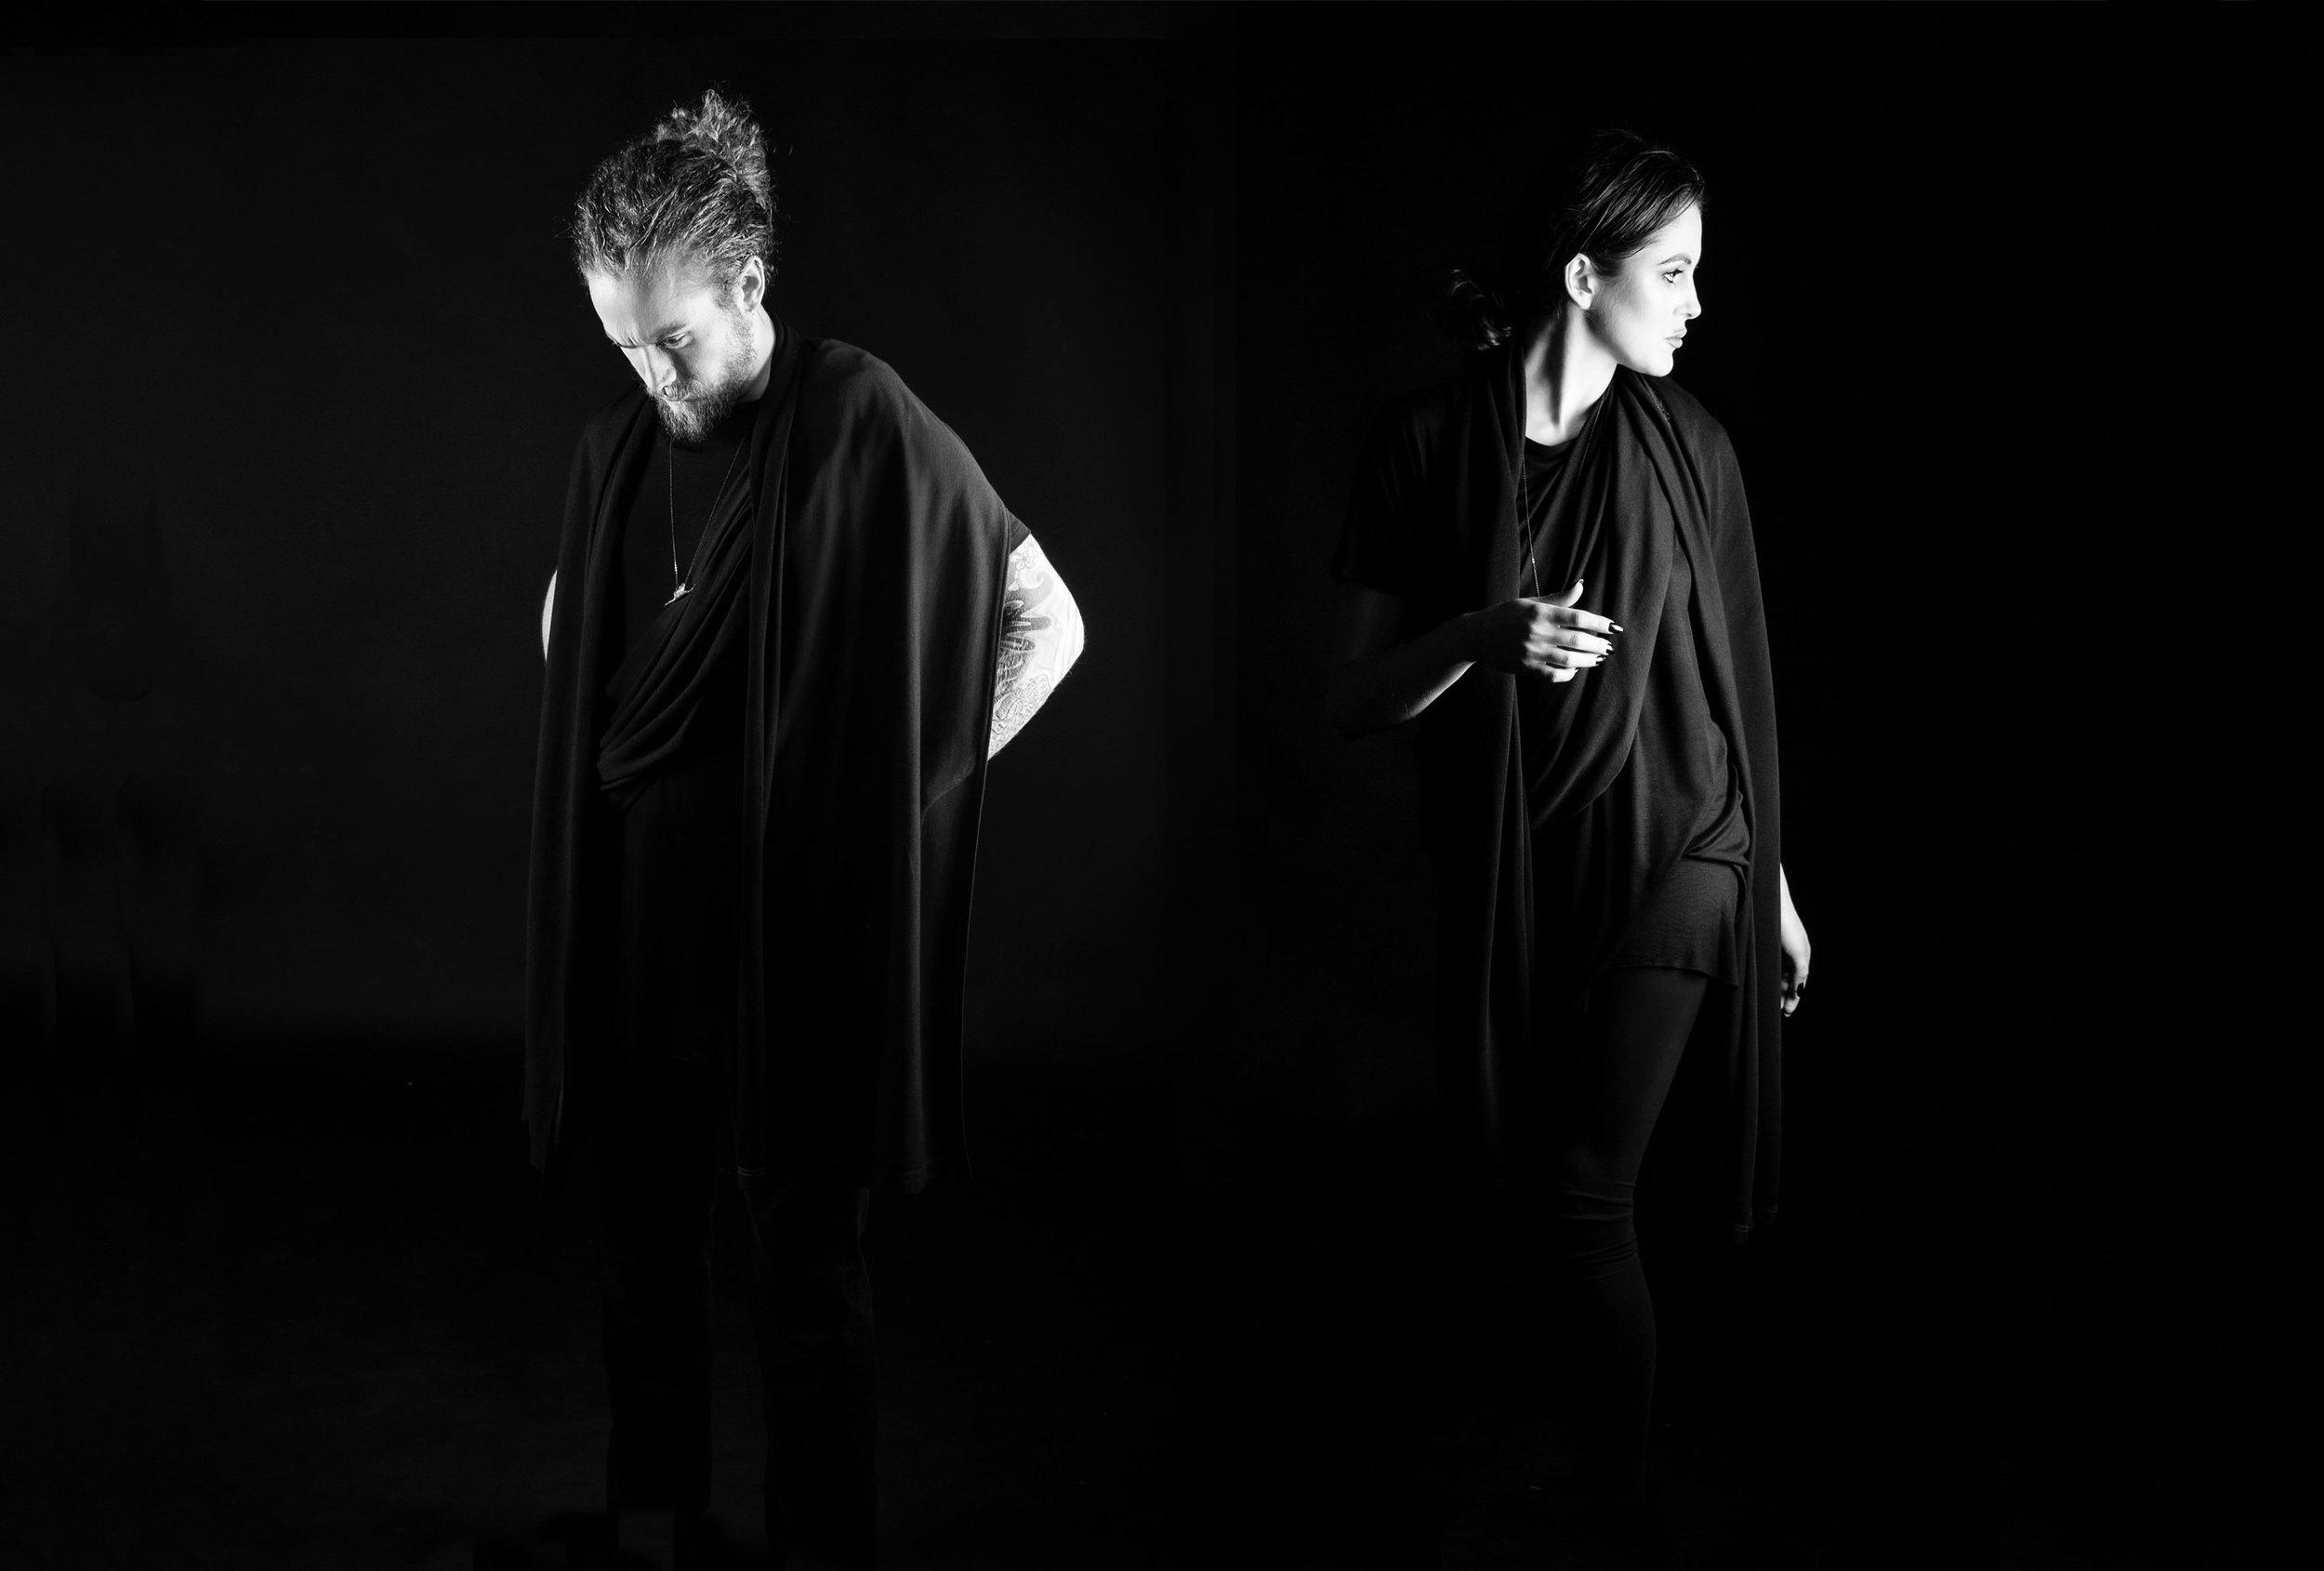 Yang-Velvit-Black-Clothing-All-Black-19.jpg